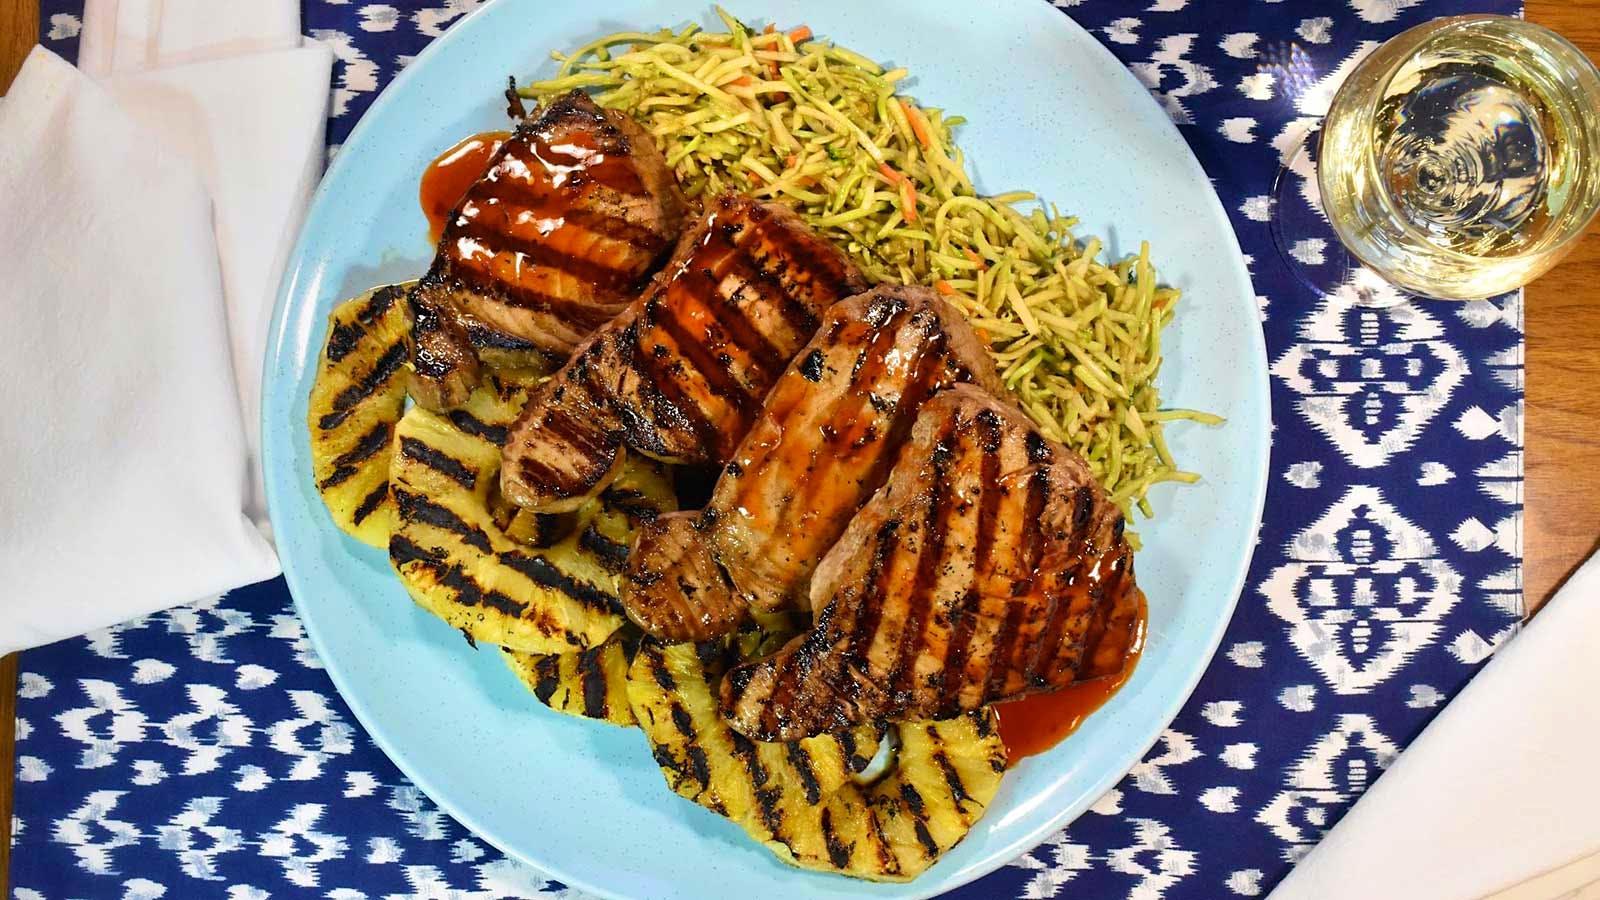 Seared Ahi Tuna Steaks with Grilled Pineapple, Sweet Chile Sauce and Broccoli Slaw